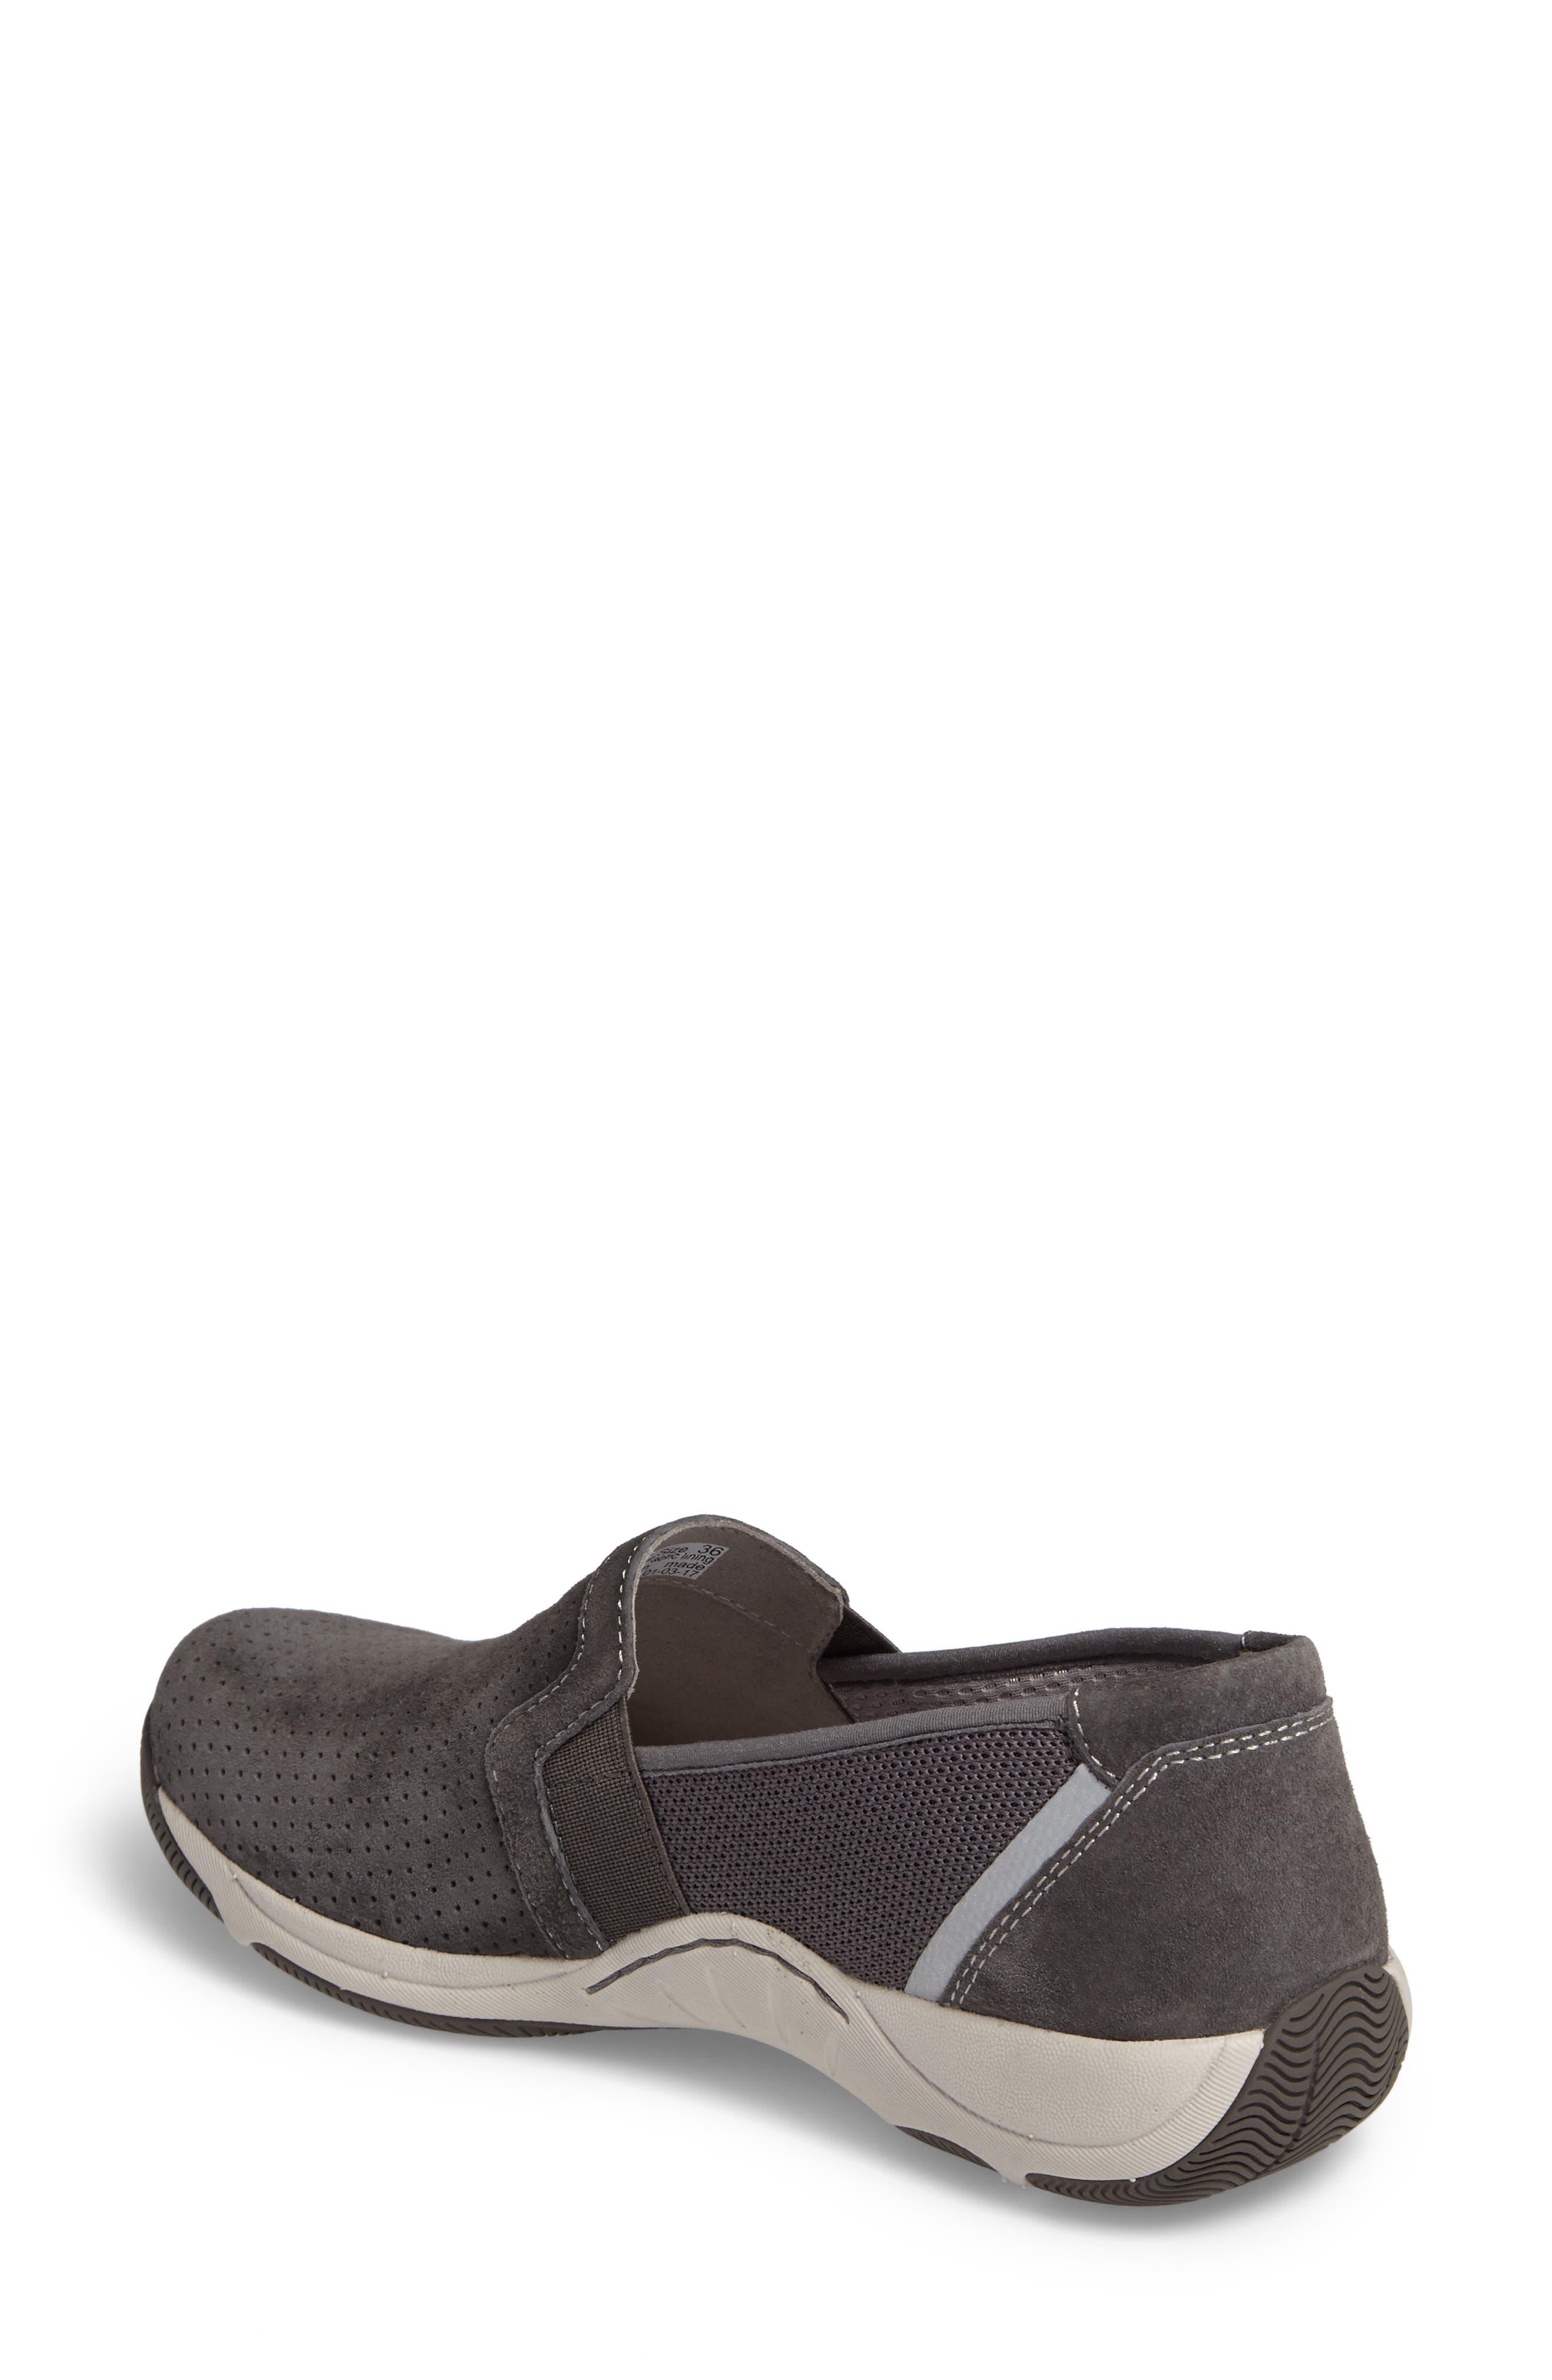 Alternate Image 2  - Dansko Halifax Collection Halle Slip-On Sneaker (Women)